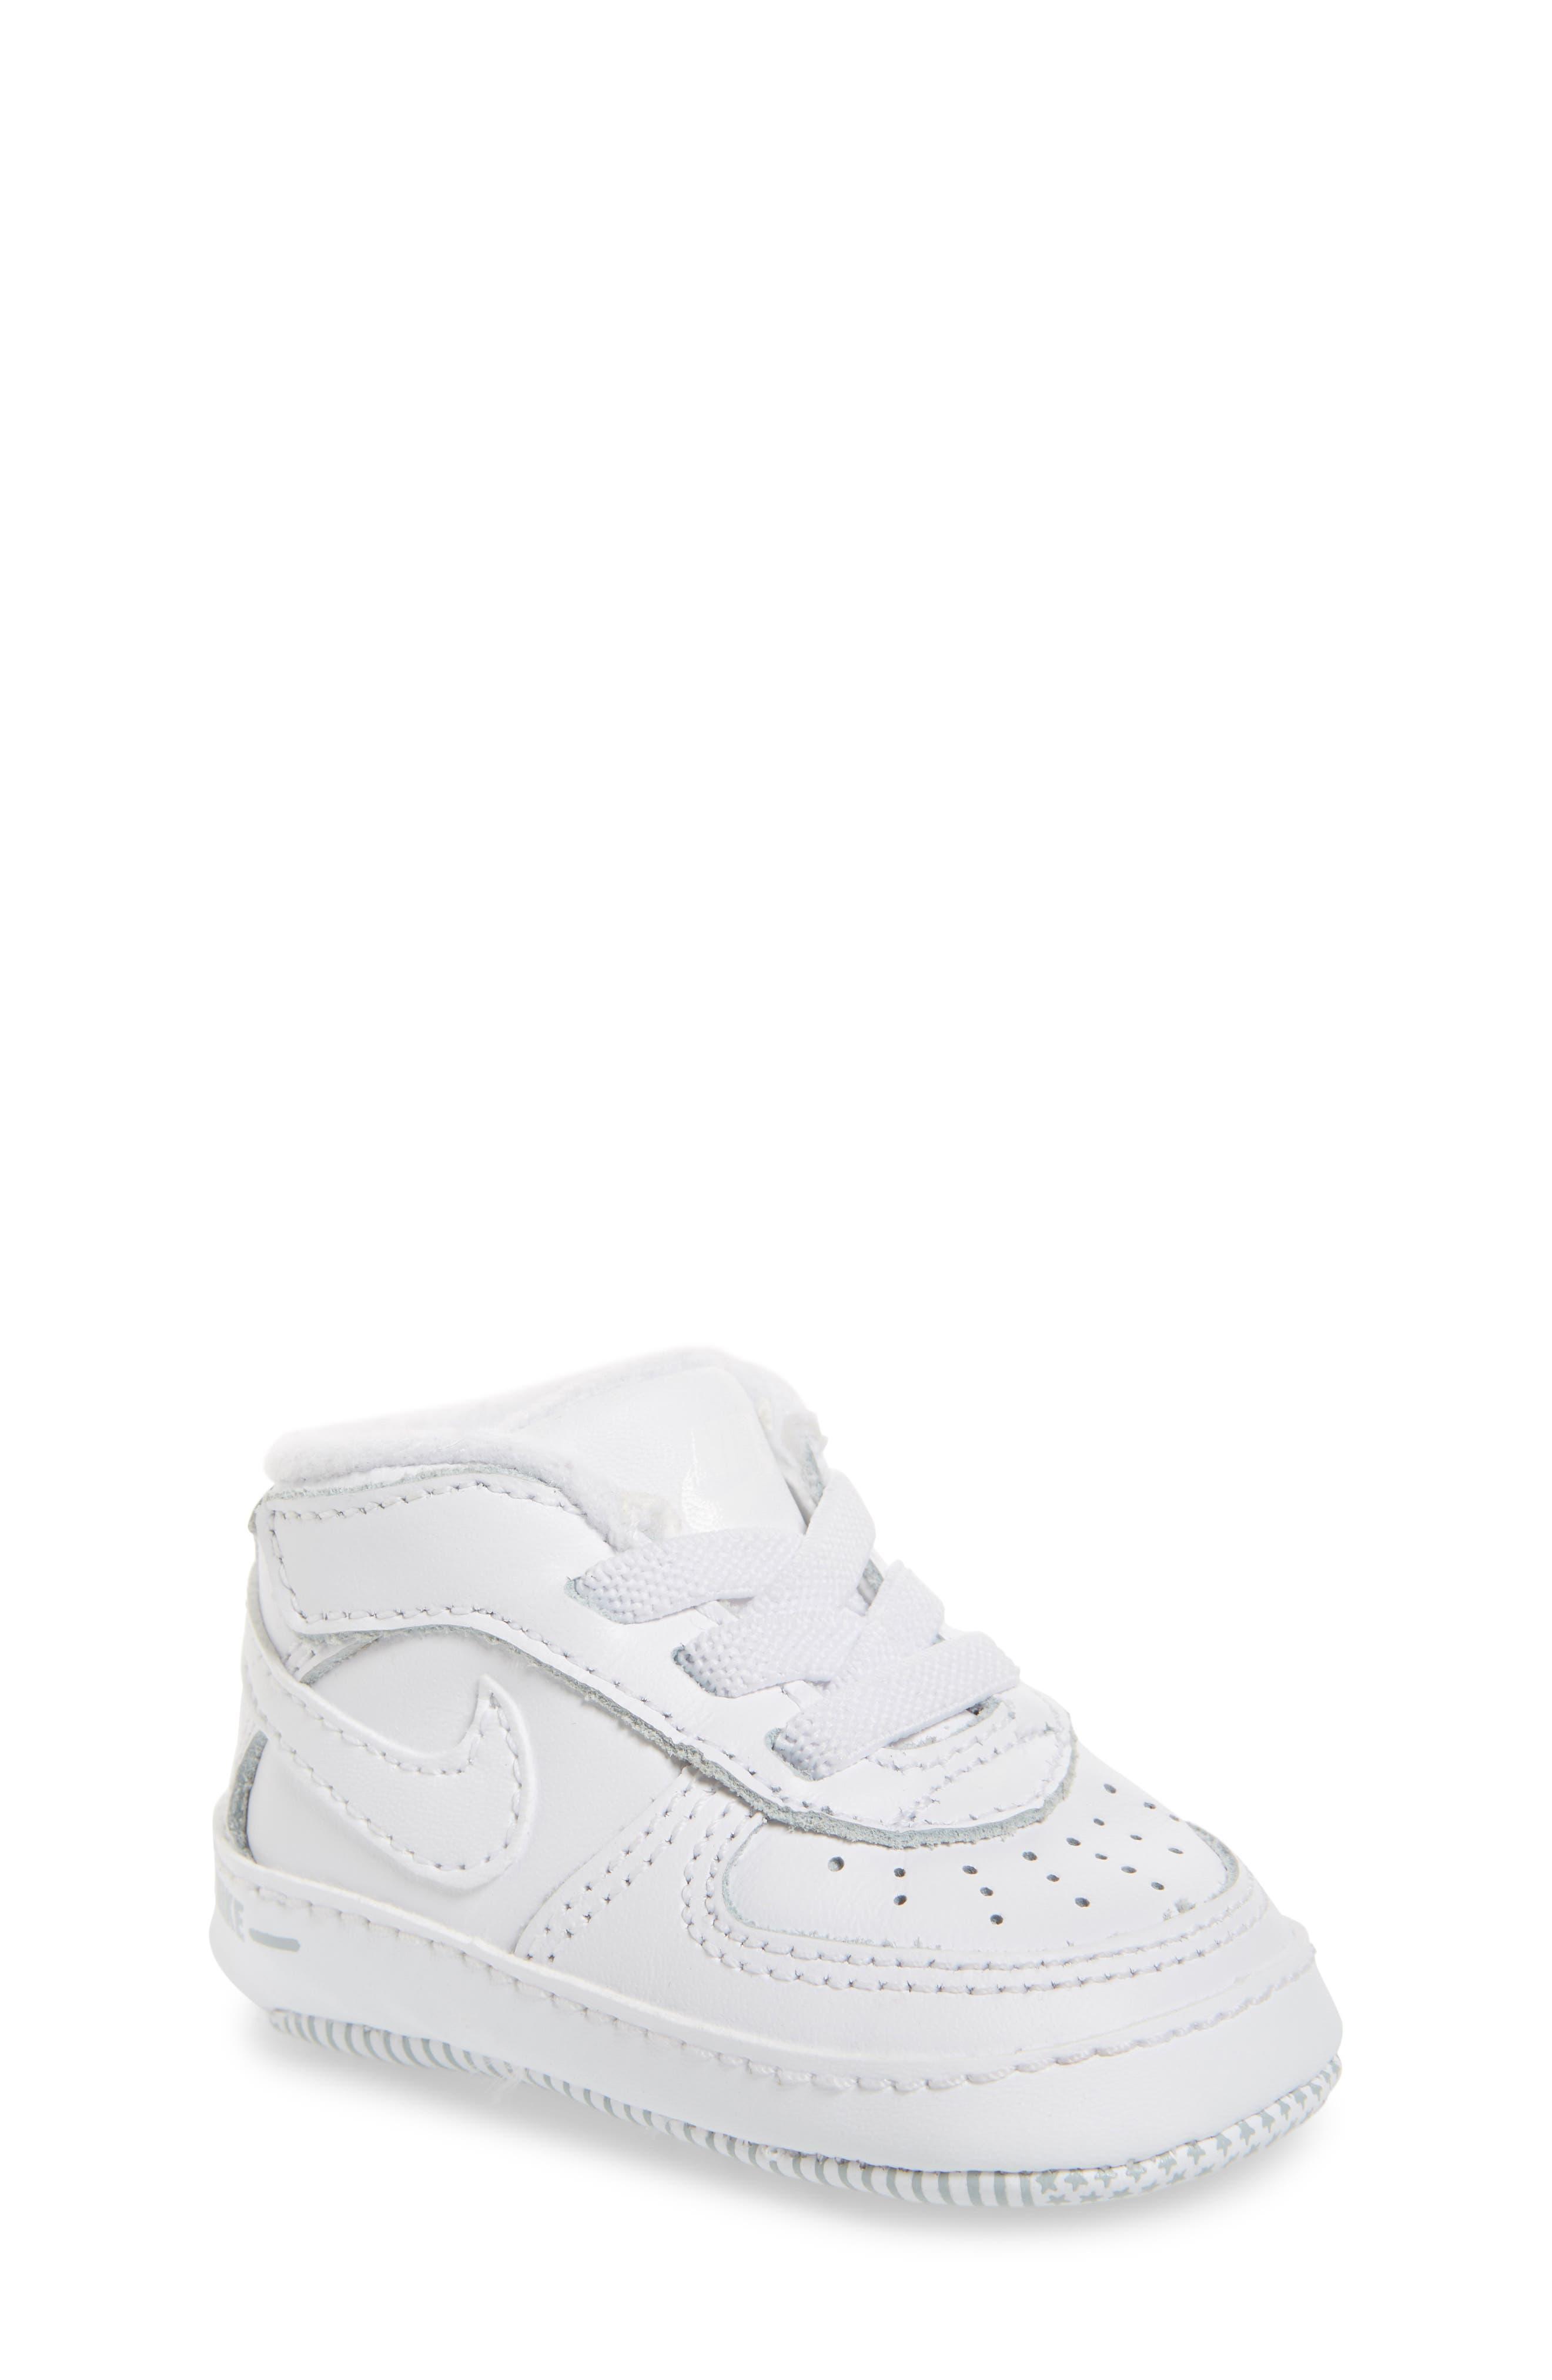 NIKE Air Force 1 Sneaker, Main, color, WHITE/ WHITE/ WHITE